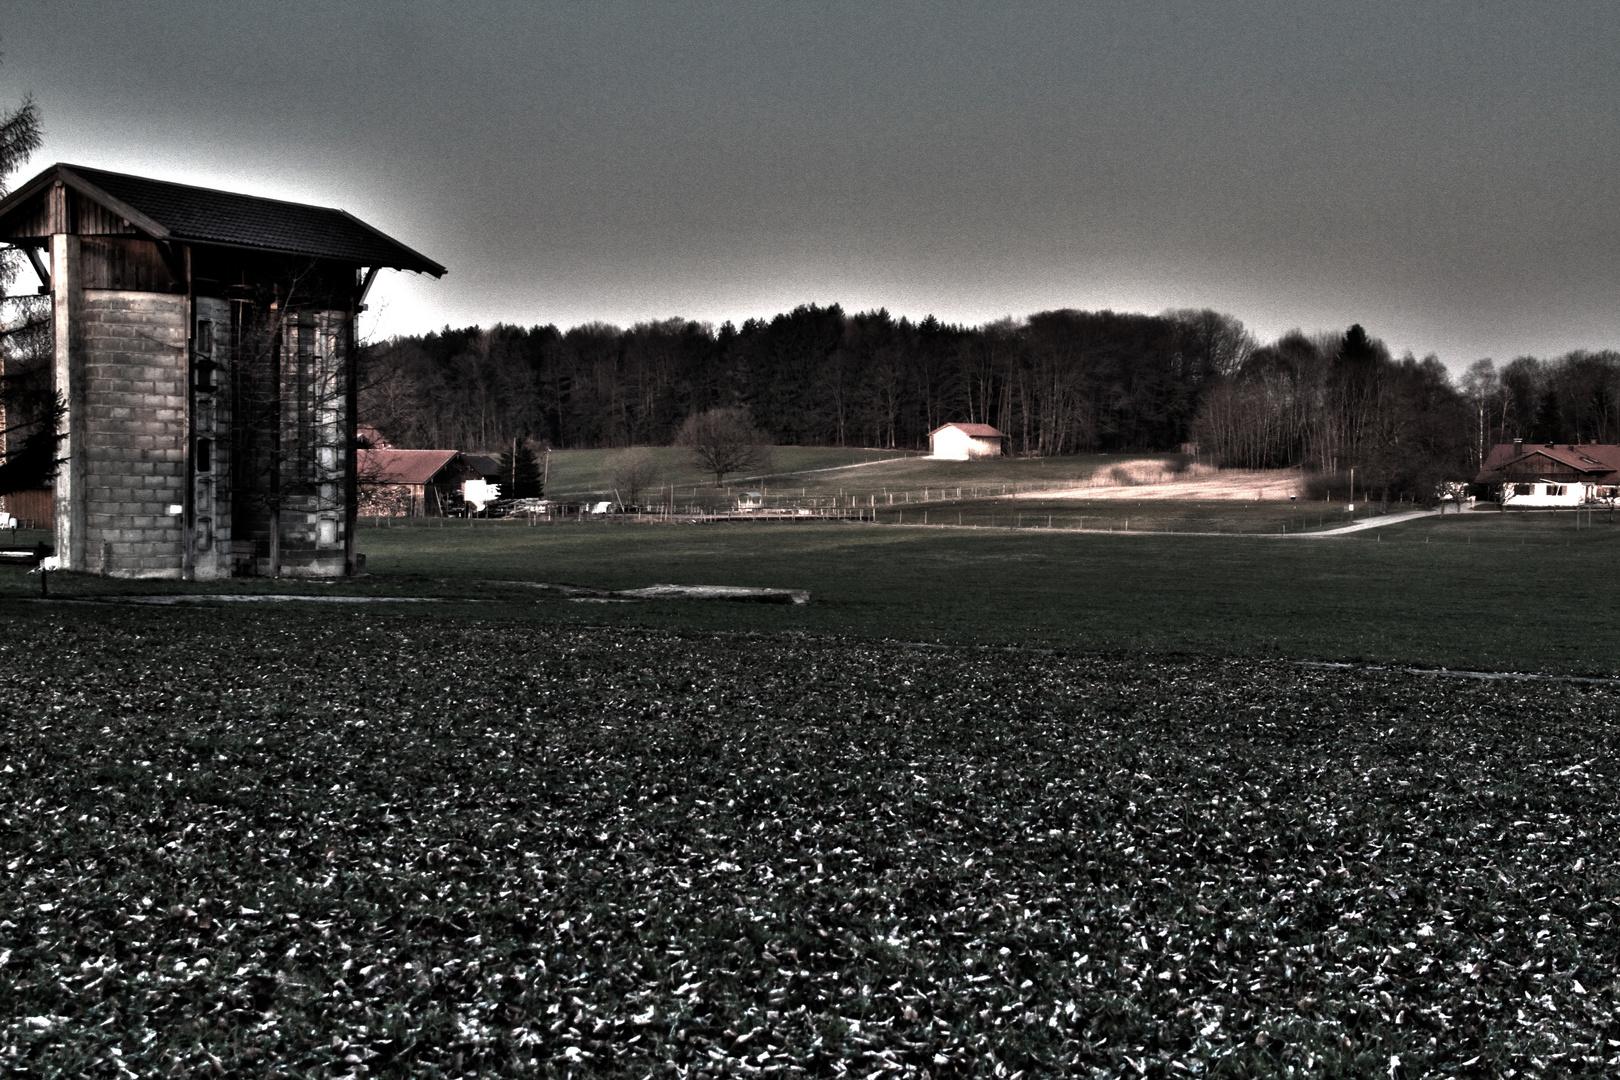 Silos am Feld